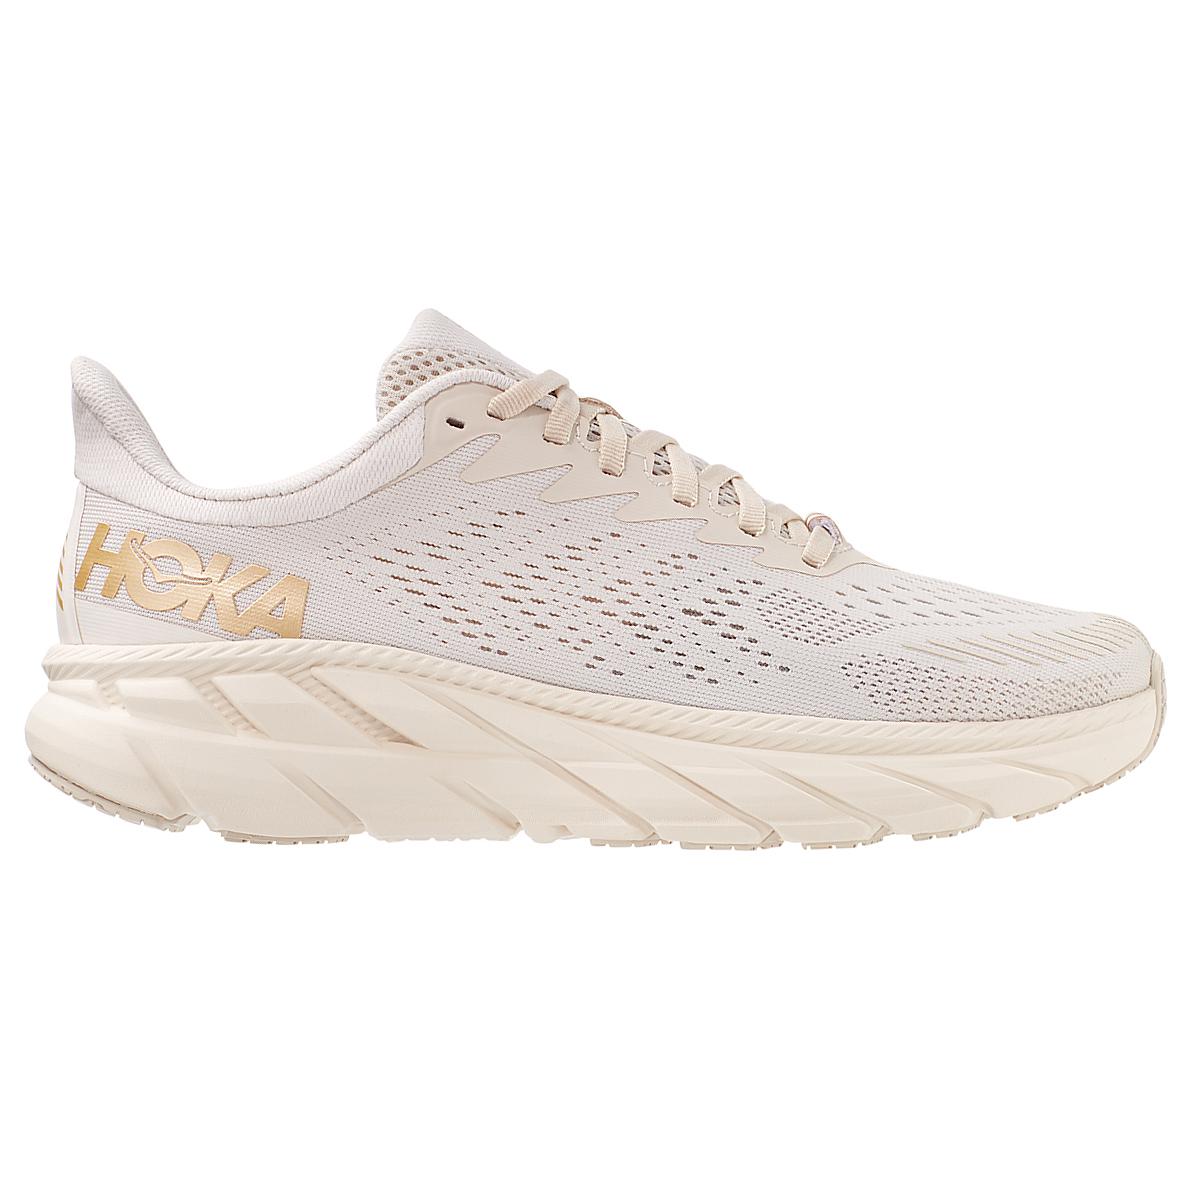 Women's Hoka One One Clifton 7 Running Shoe - Color: Almond Milk/Bronze - Size: 5 - Width: Regular, Almond Milk/Bronze, large, image 2